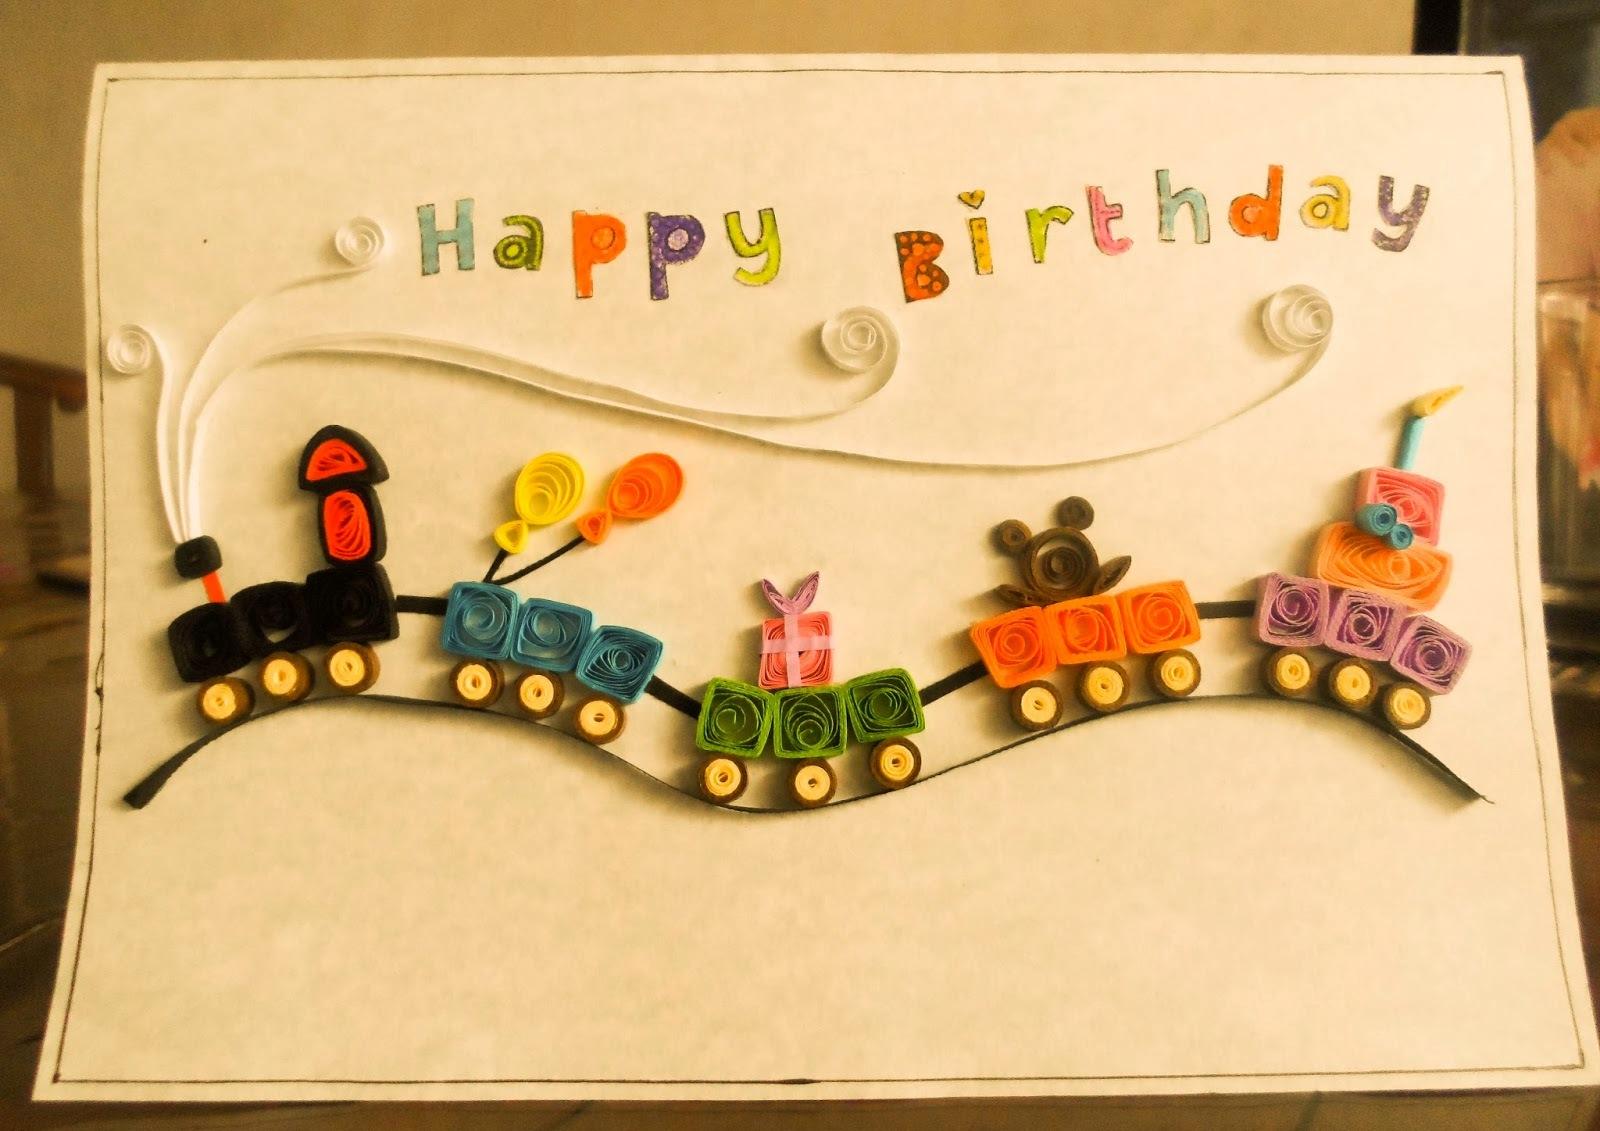 Handmade paper quilling birthday card art projects art ideas for Handmade paper craft ideas